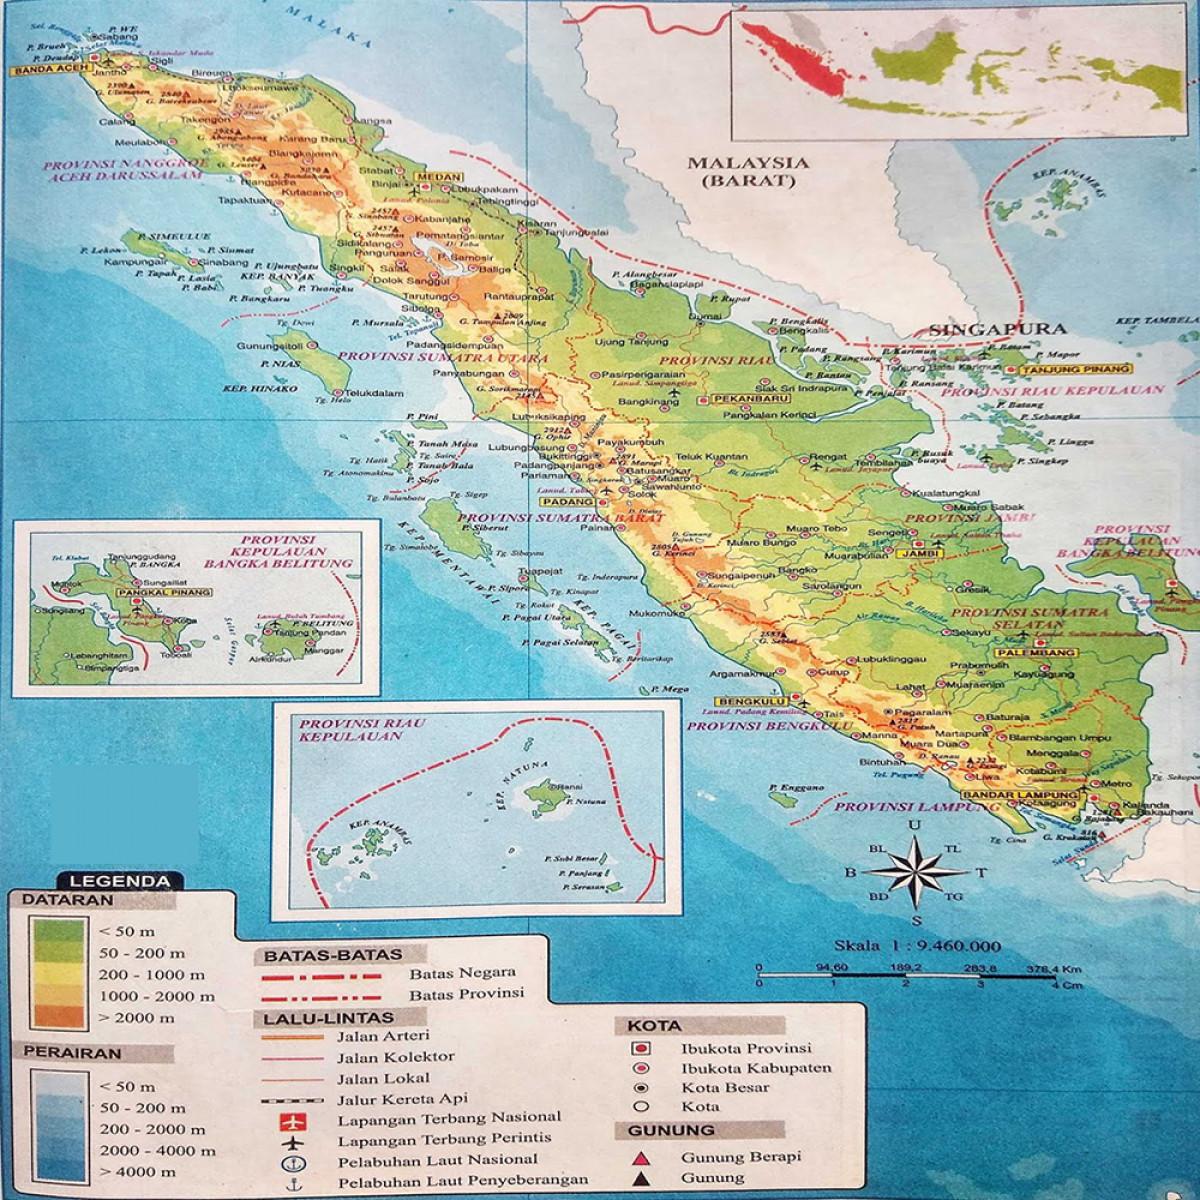 Sejarah Hari Ini (26 September 1959) - Sumatra Terbagi dalam Tiga Provinsi